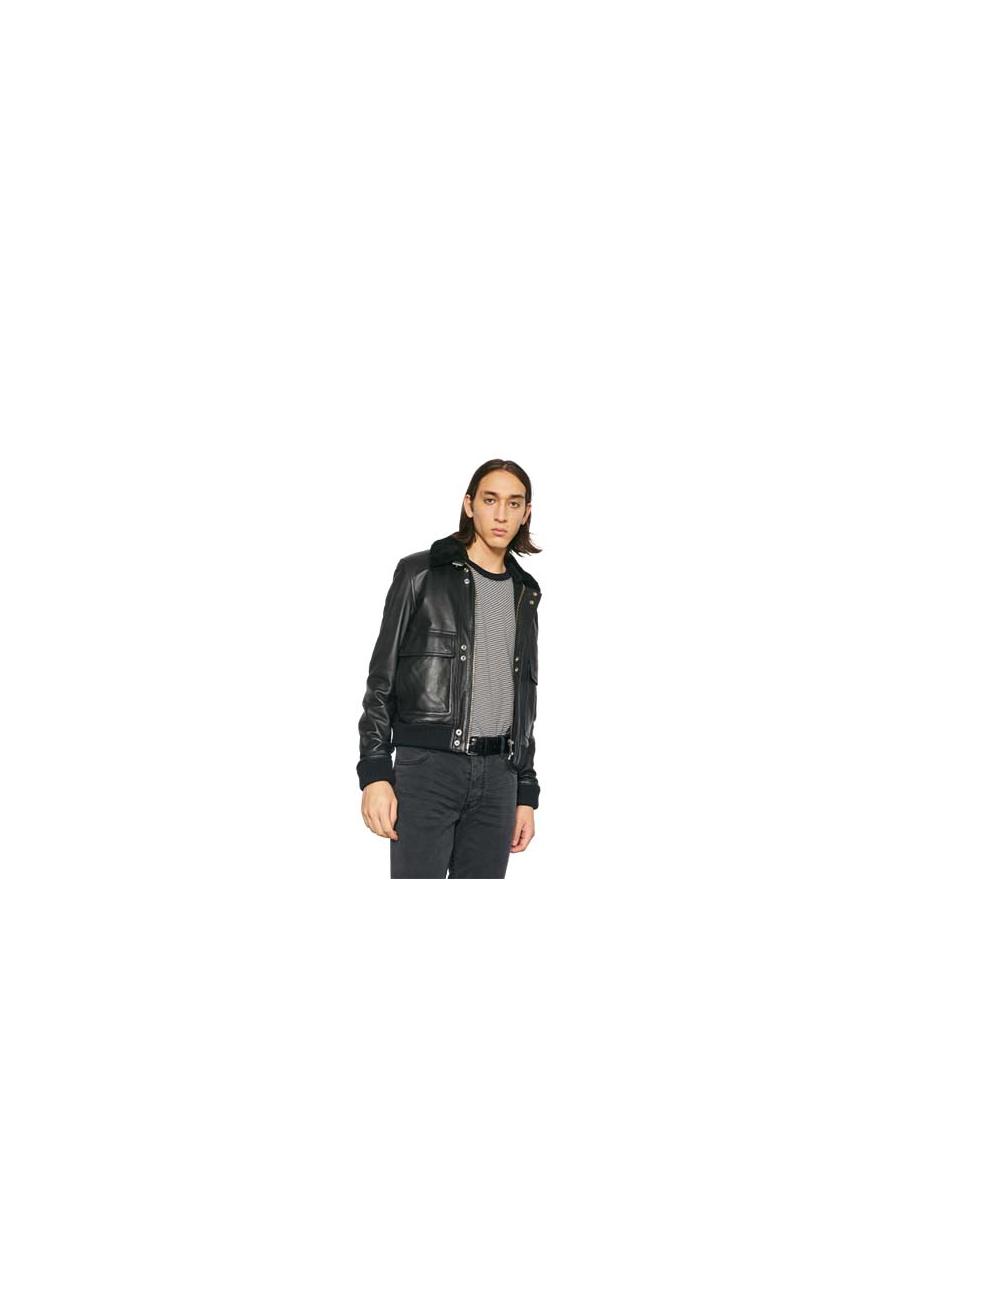 Leather jacket Volf  Iro - BIG BOSS MEGEVE